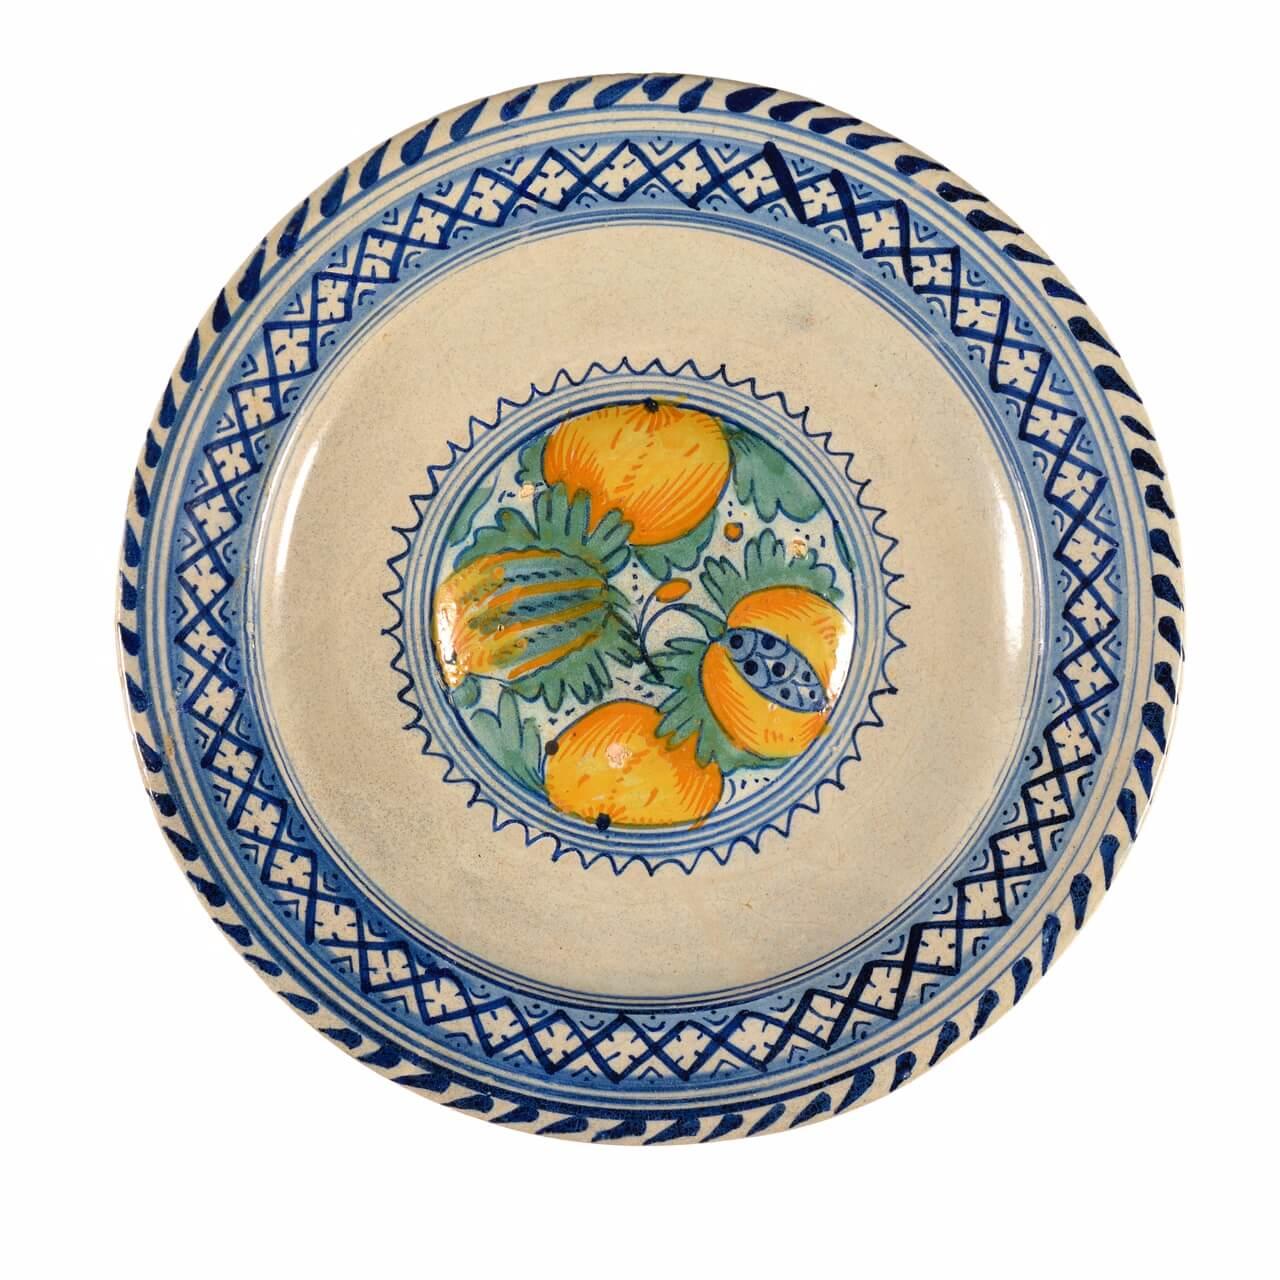 Antique majolica polychrome dish at Aronson Antiquairs